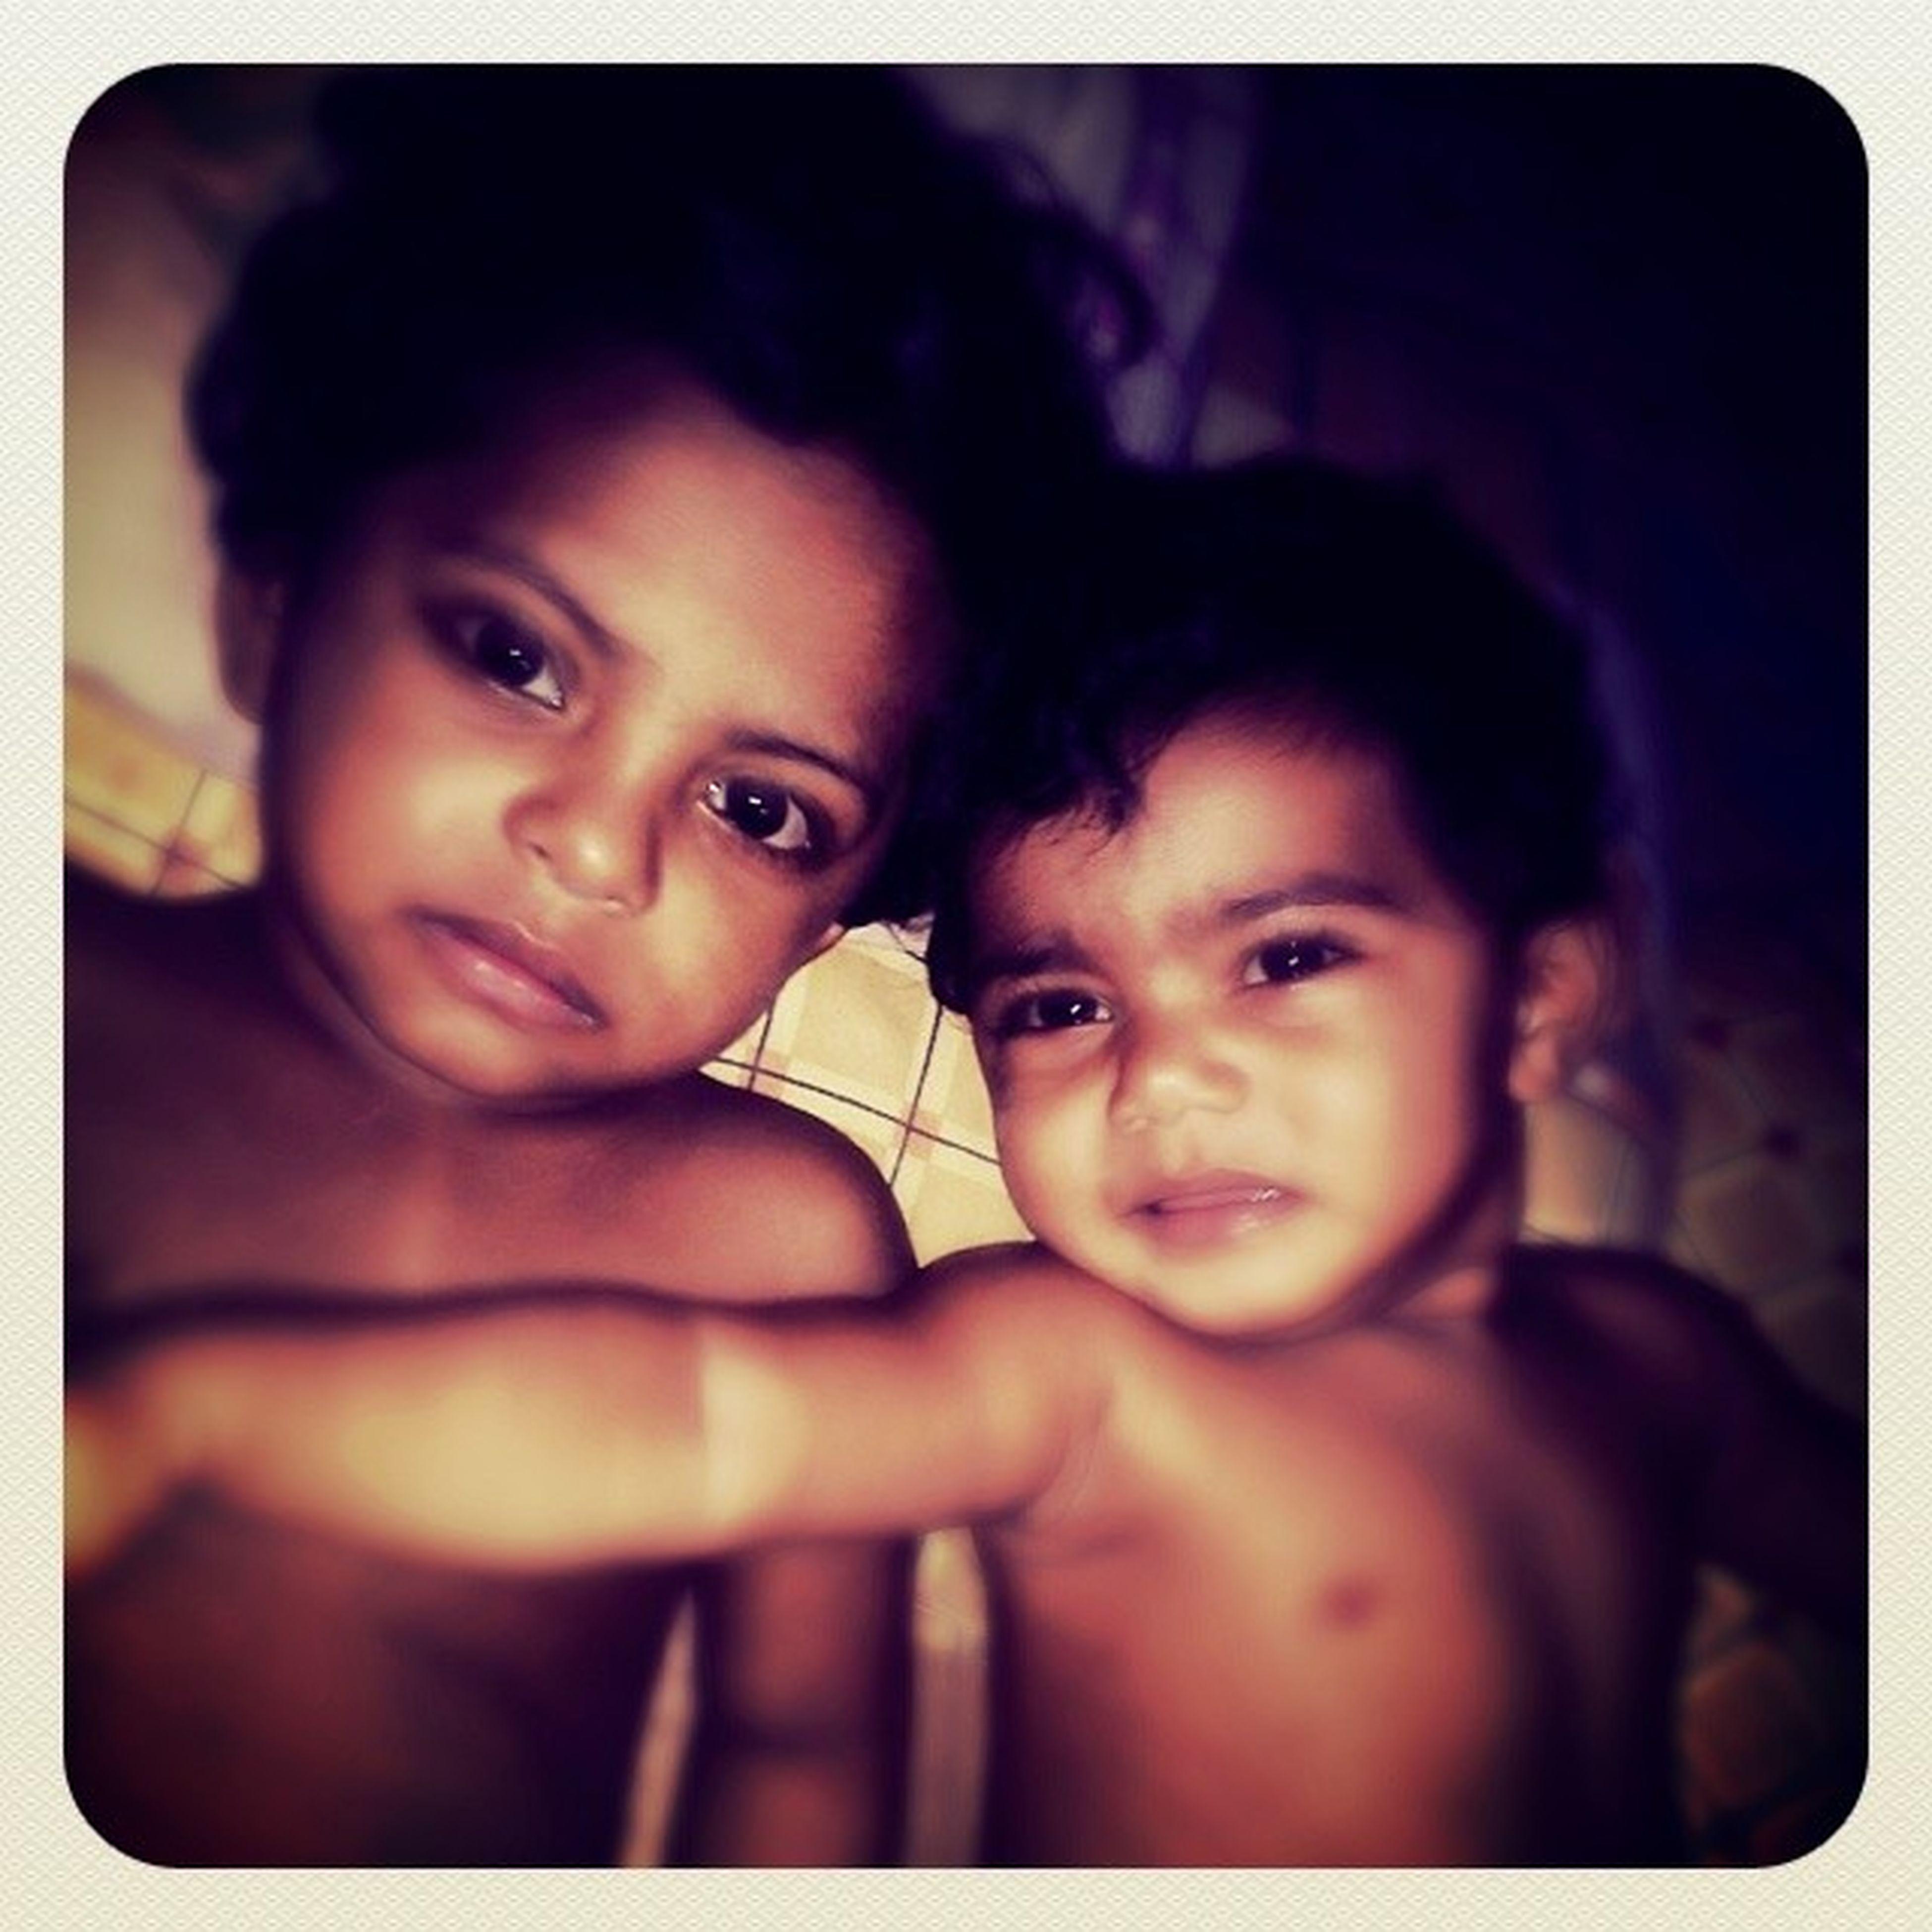 My chill buddy(zavl) and my janburoal(Kayaan) hama heyli gothah.. :p Babies KayaanGeCryFace ZavlHamaJehifa Love Brothers For Eternity